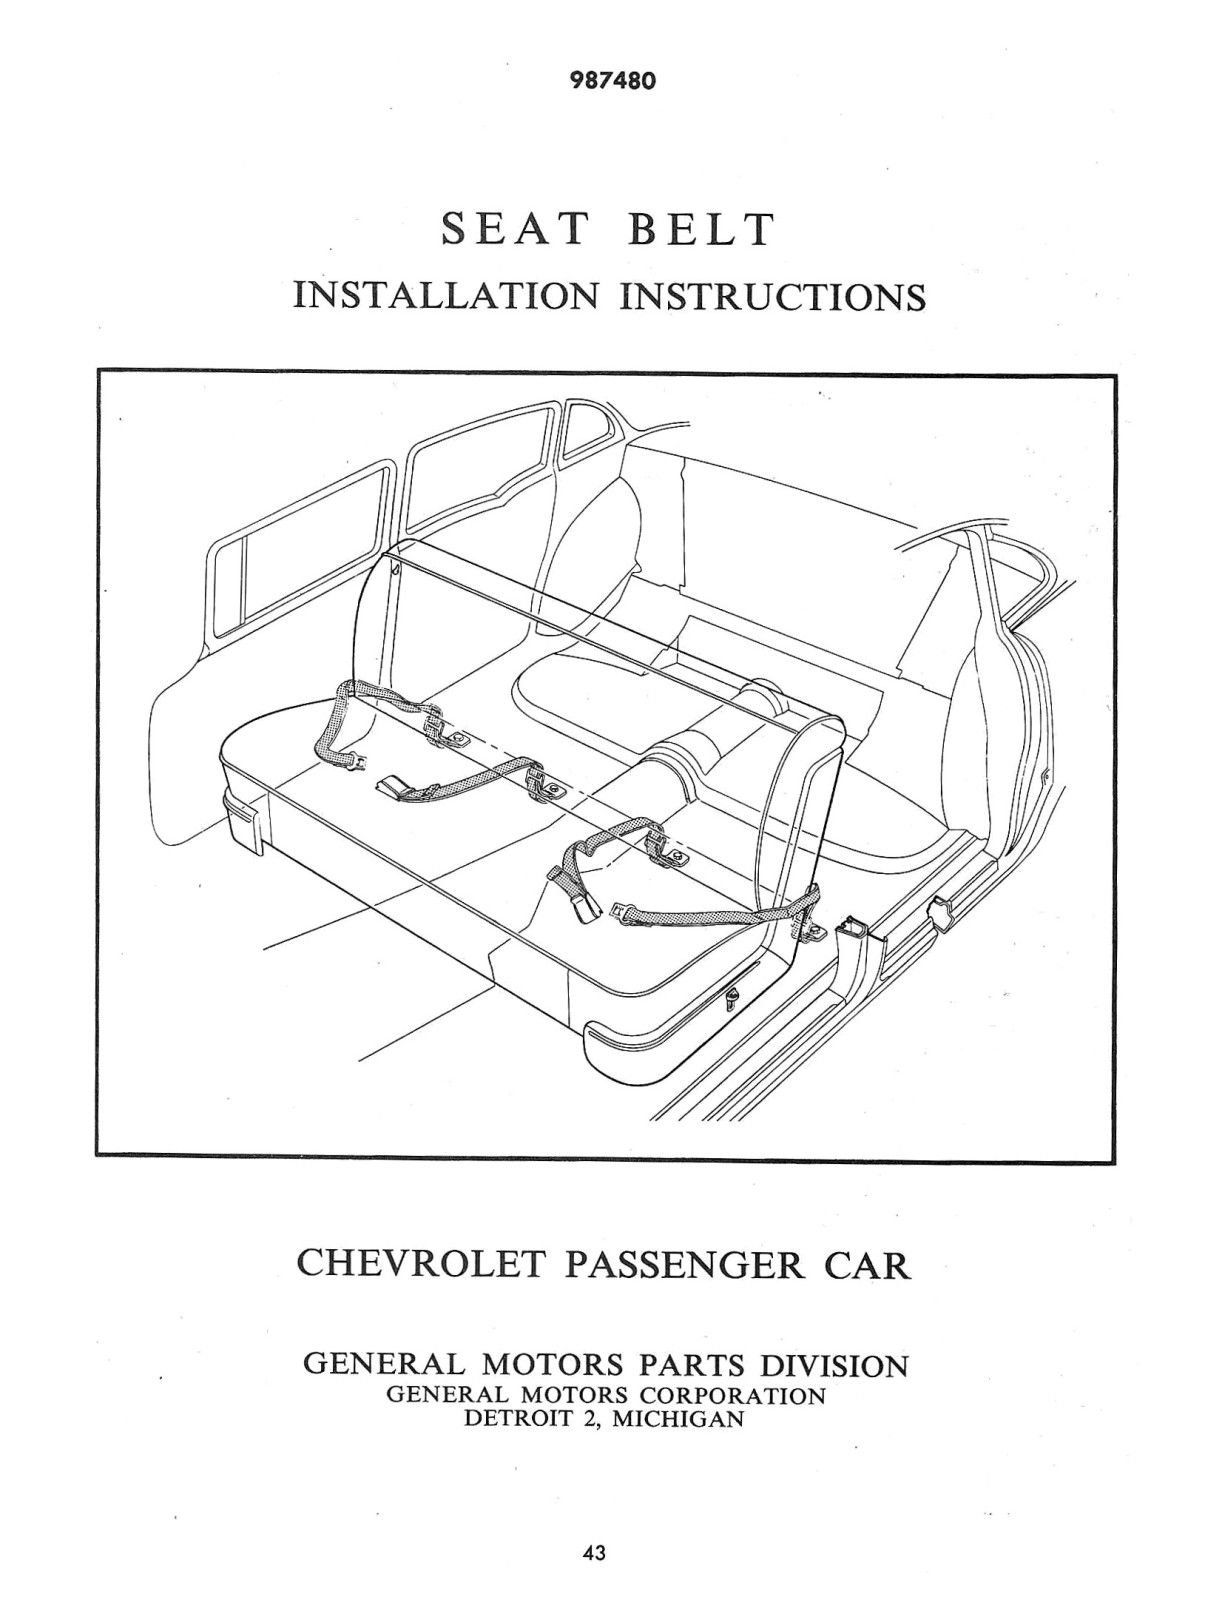 Seat Belt Info Truck Accessories 1955 Chevy Bel Air Chevrolet